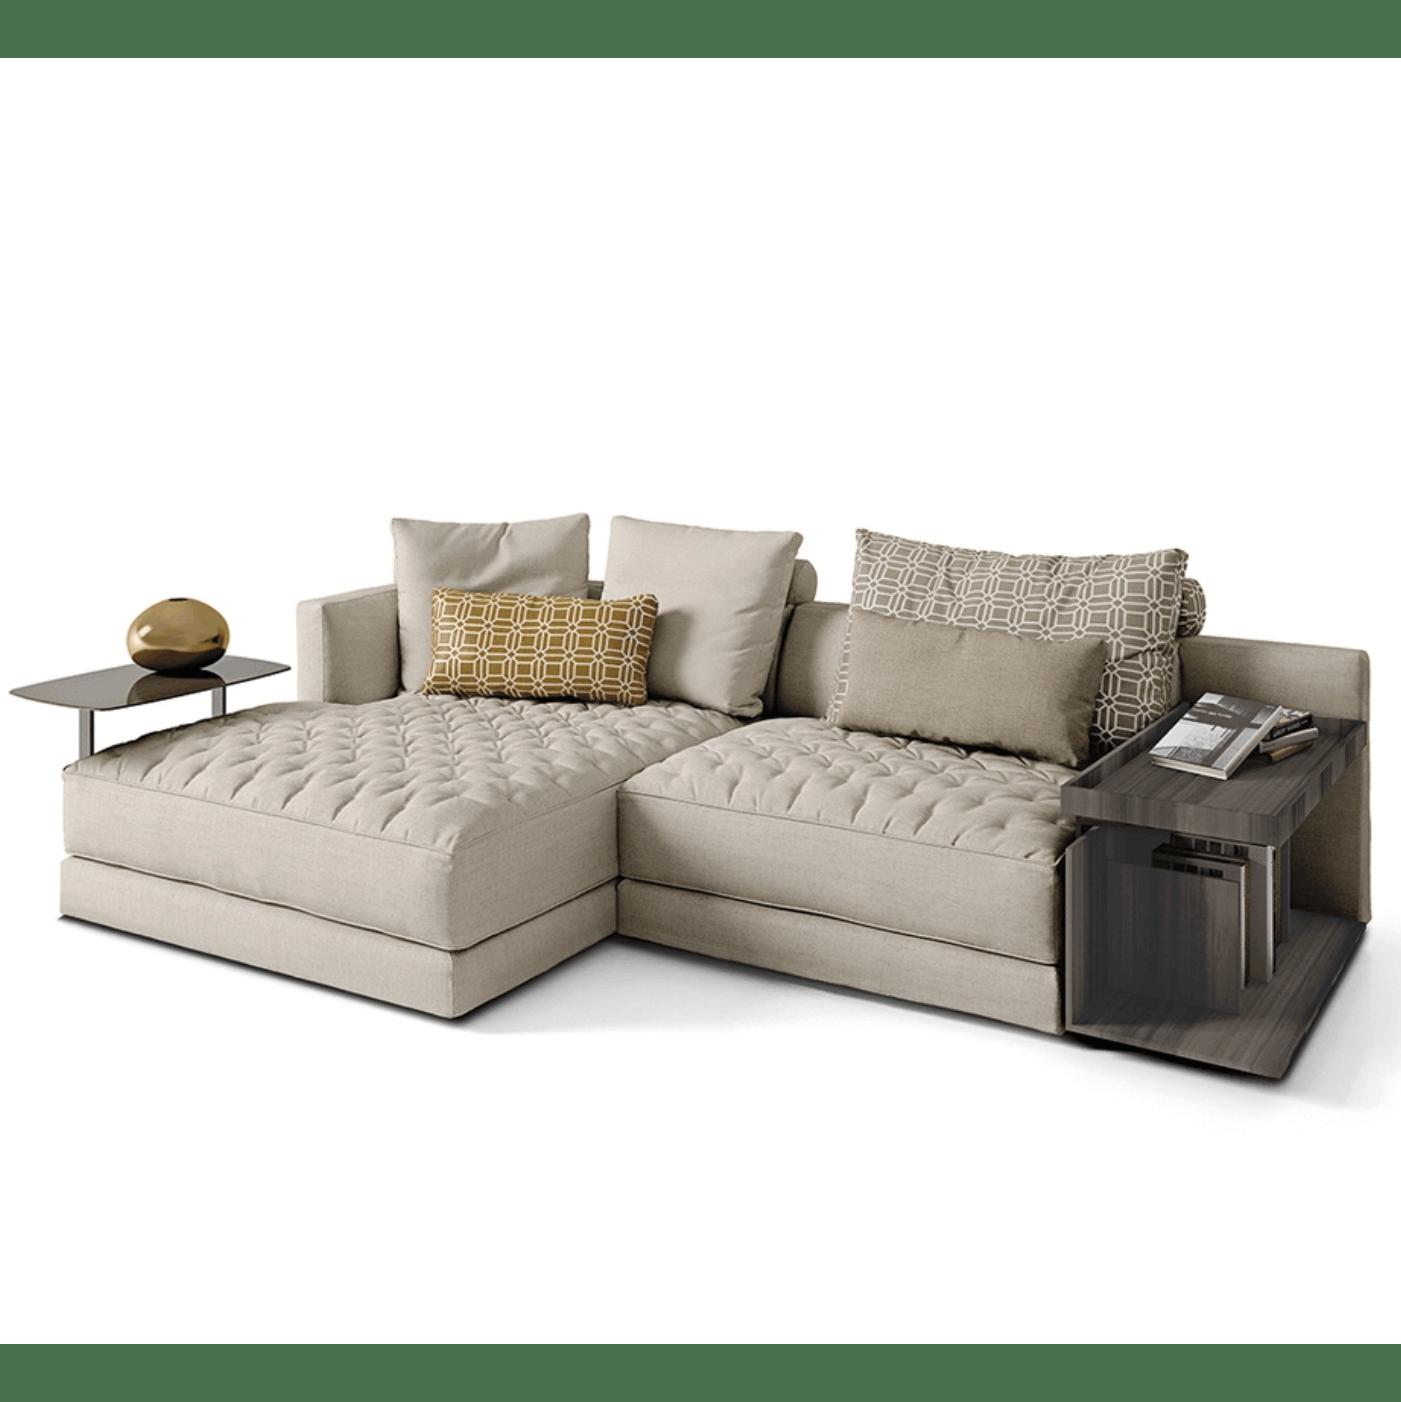 Frigerio Miller Sofa Front3 Haute Living Copy